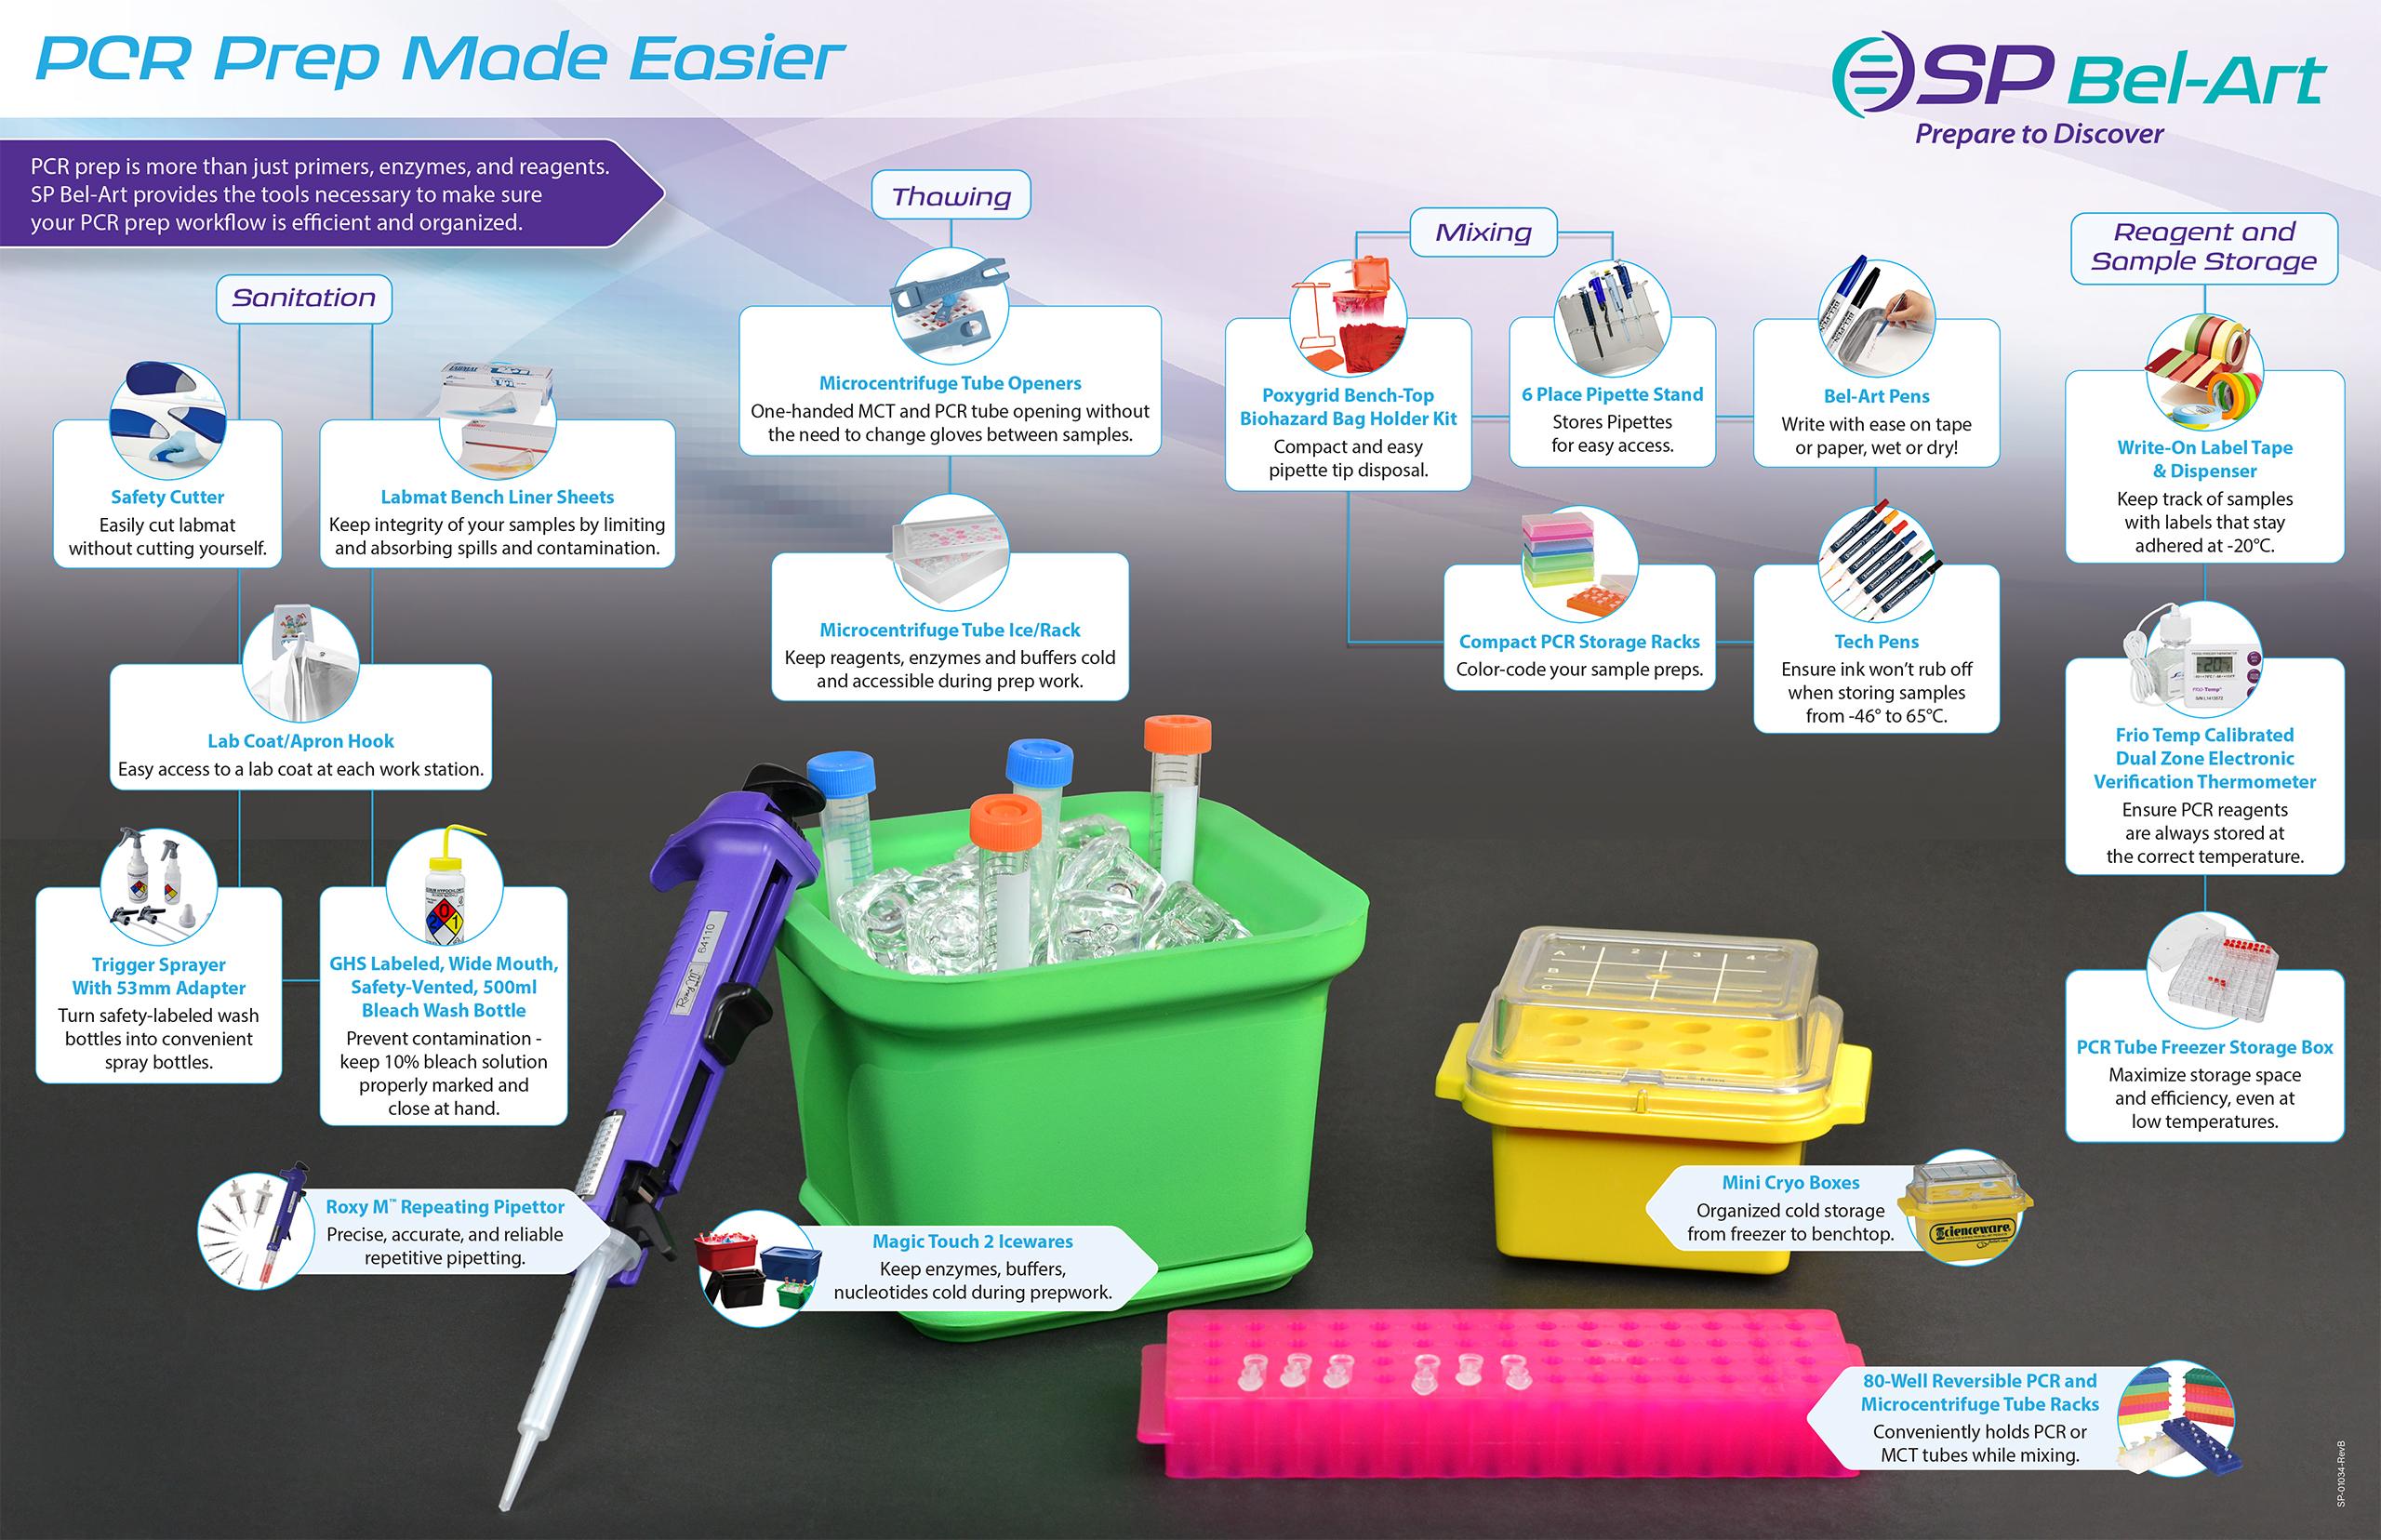 Image: PCR Prep Made Easier - Workflow